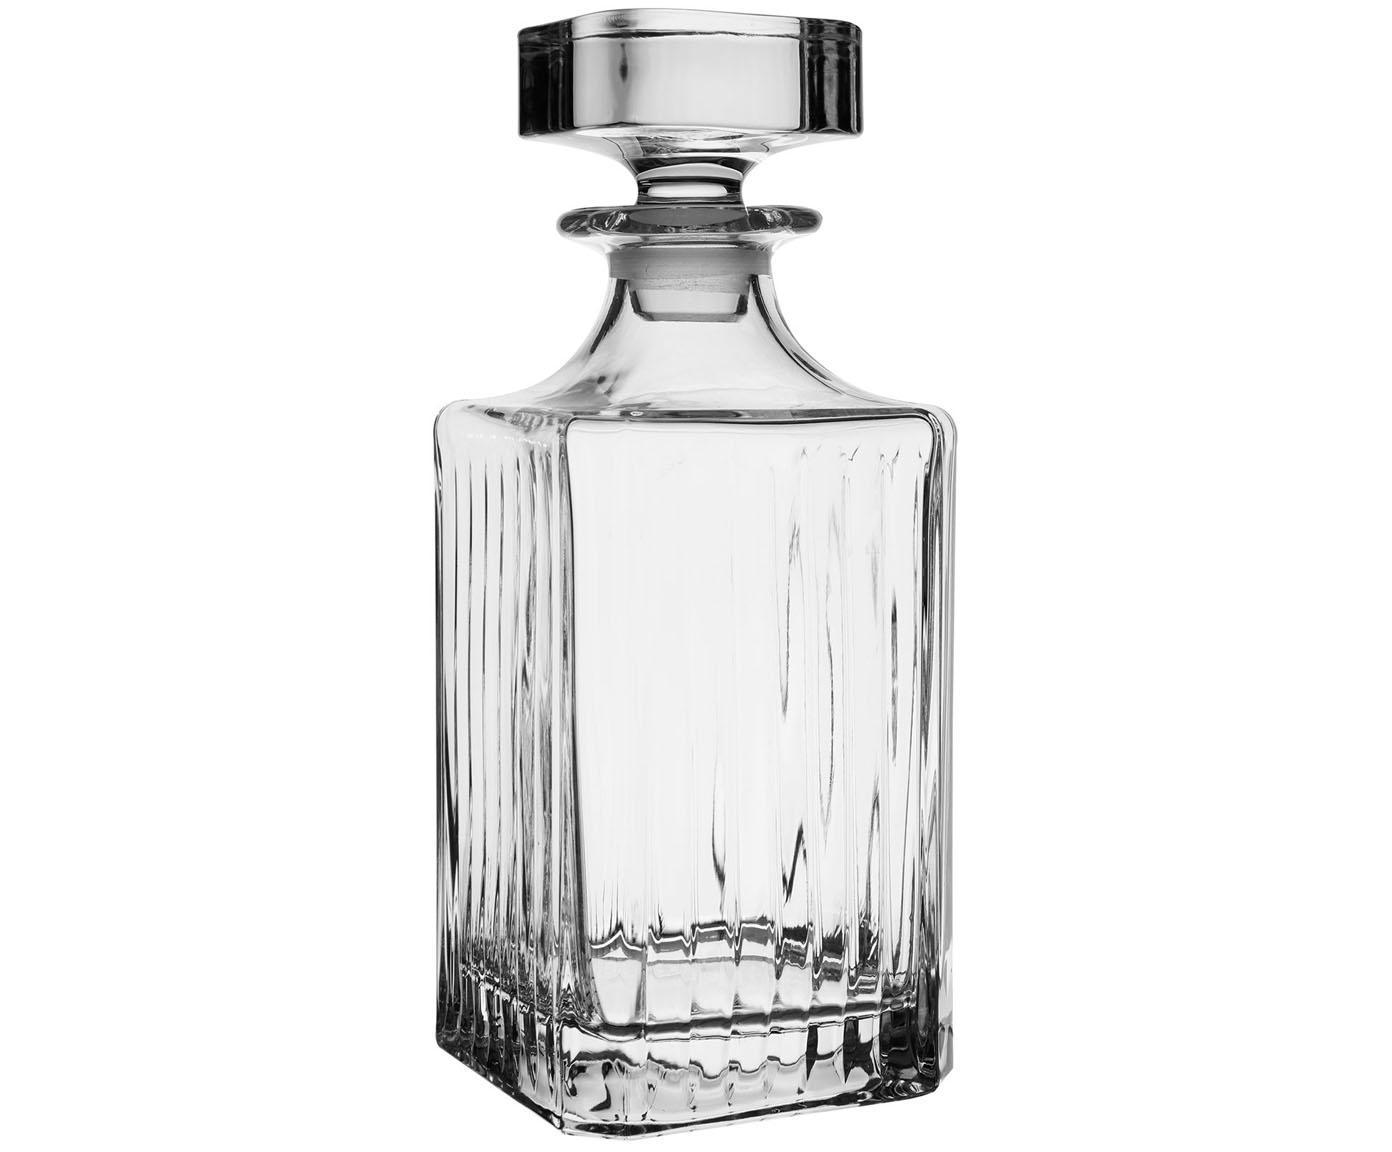 Kristalglazen karaf Timeless, Kristalglas, Transparant, H 24 cm